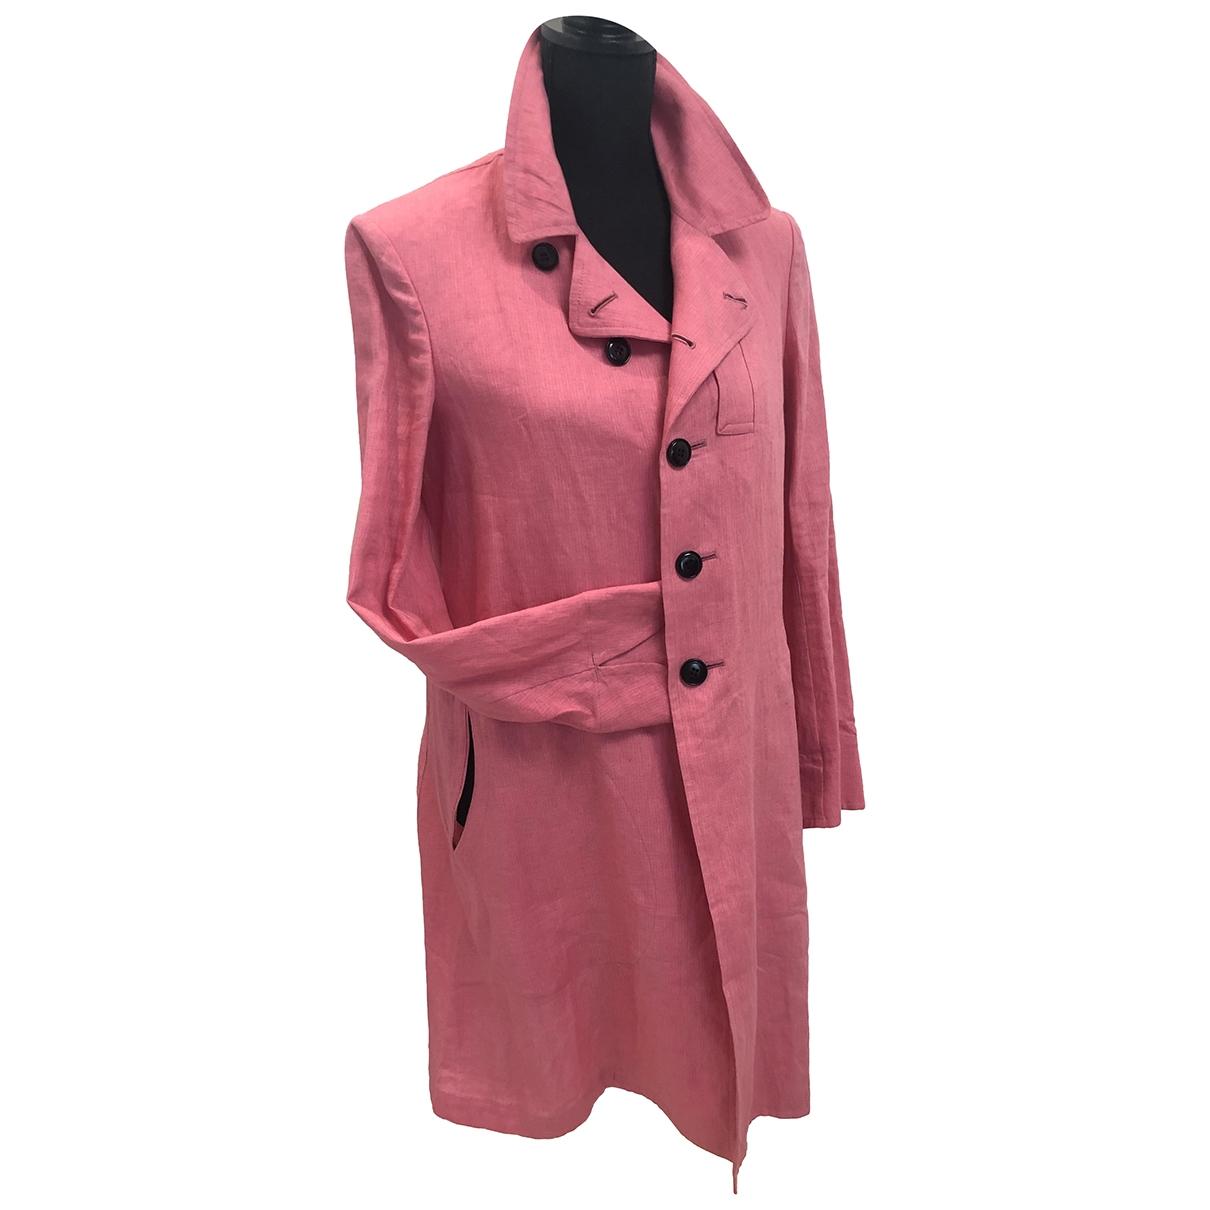 Yohji Yamamoto - Veste   pour femme en lin - rose